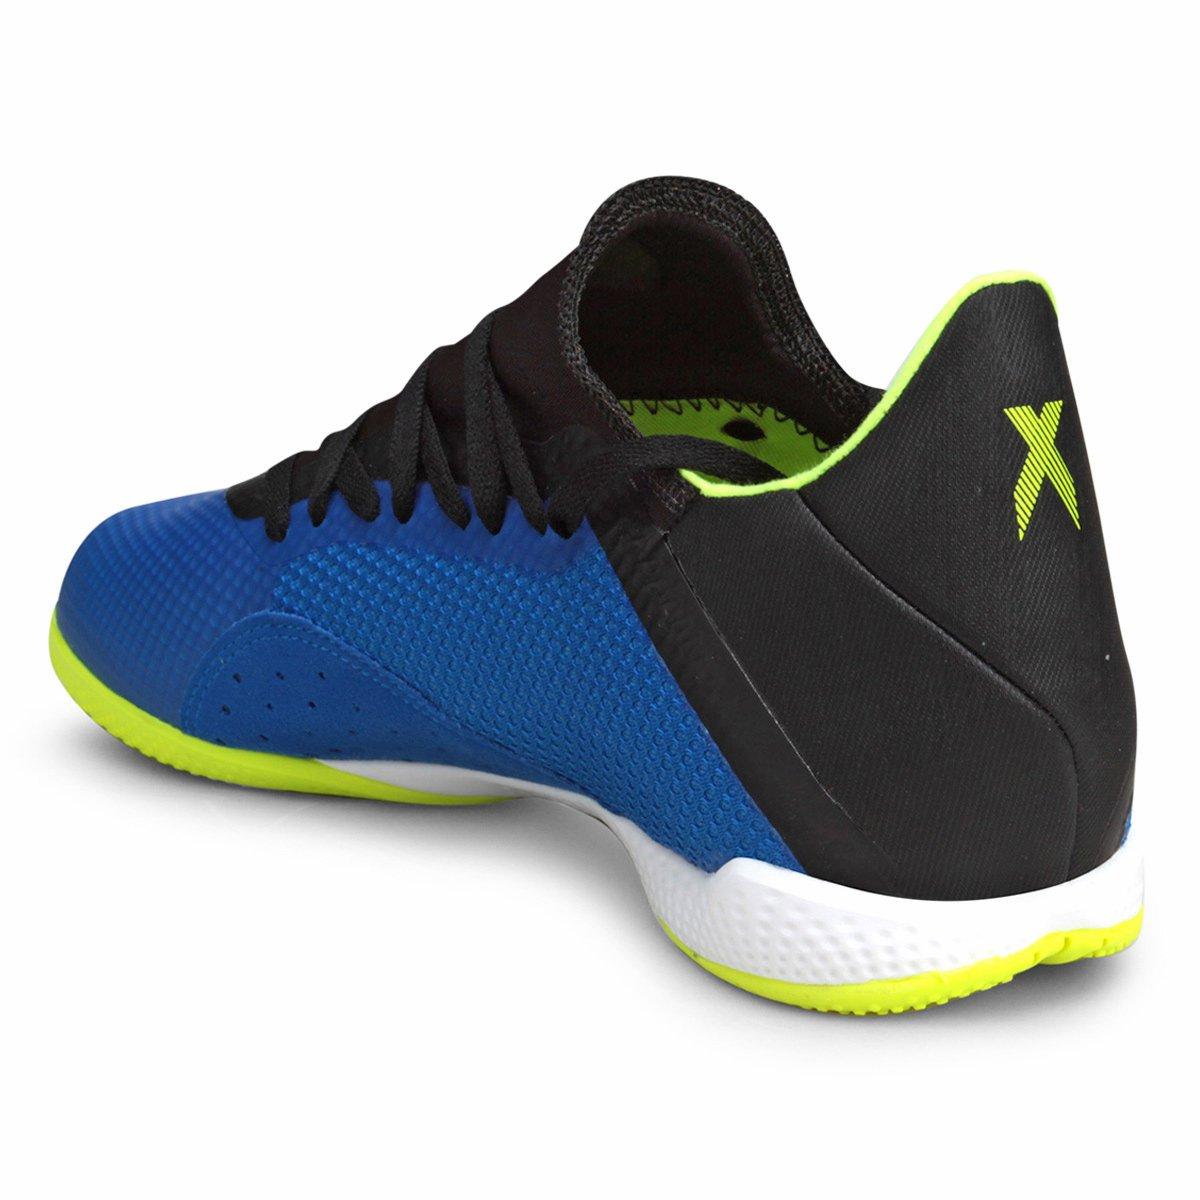 Chuteira Futsal Adidas X Tango 18 3 IN - Azul e amarelo - Compre ... c156659024db5